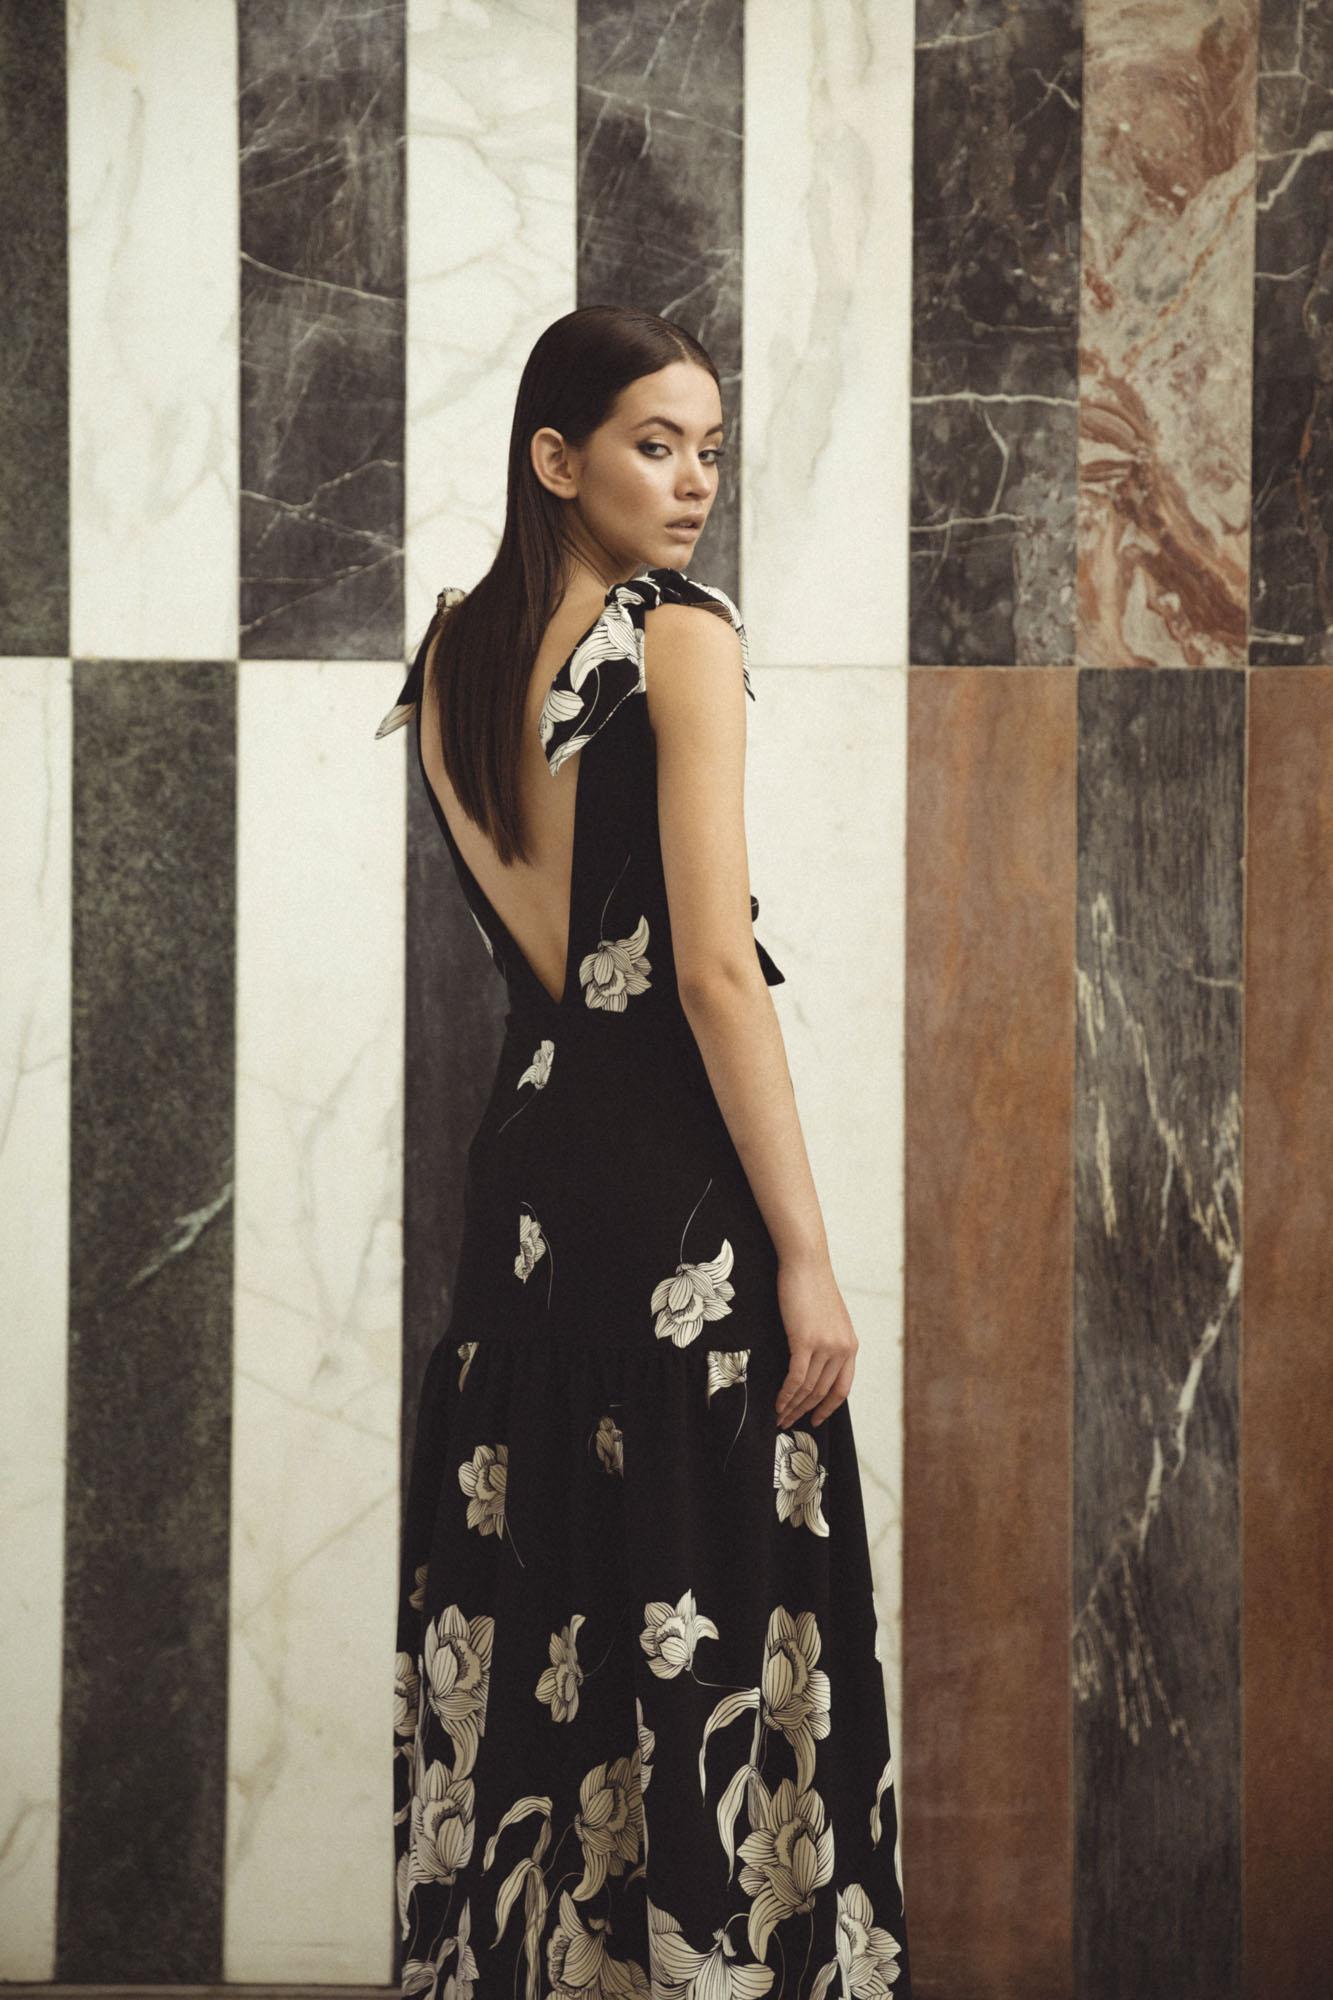 efrain_mogollon_femineus_neocapazzo_ dress.JPG